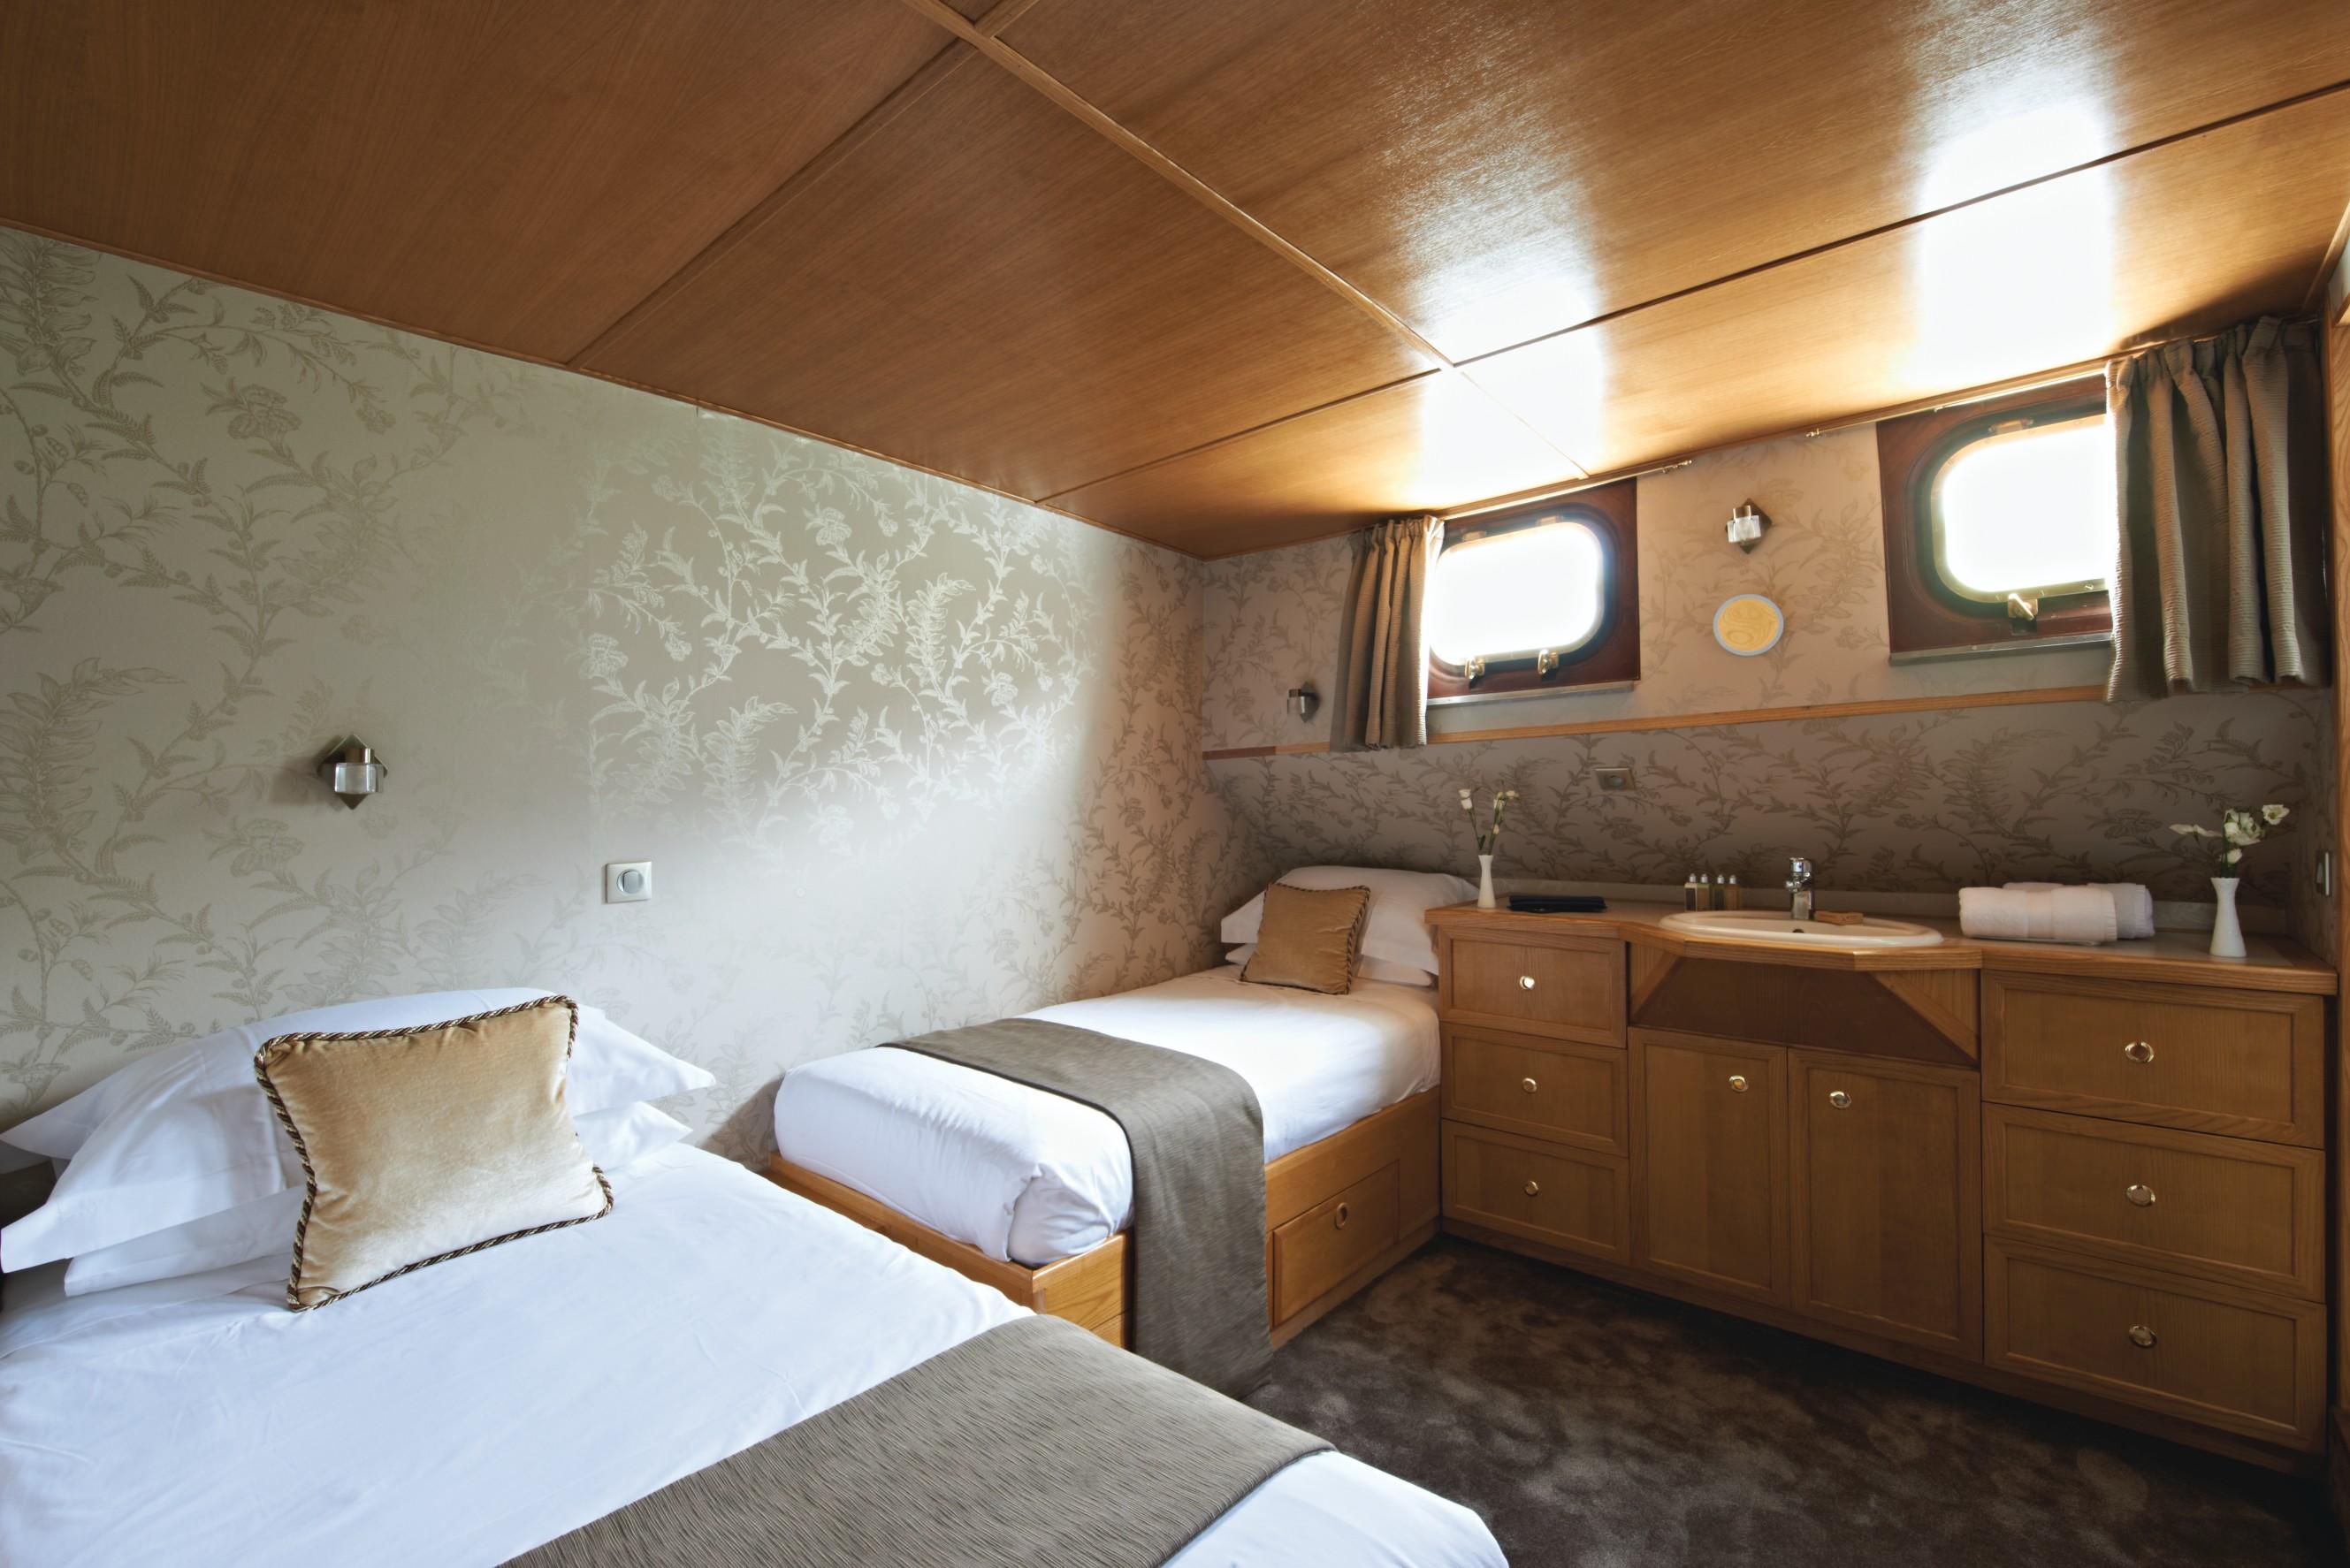 Belmond River Cruises Belmond Hirondelle Accommodation Bedroom 3.jpg